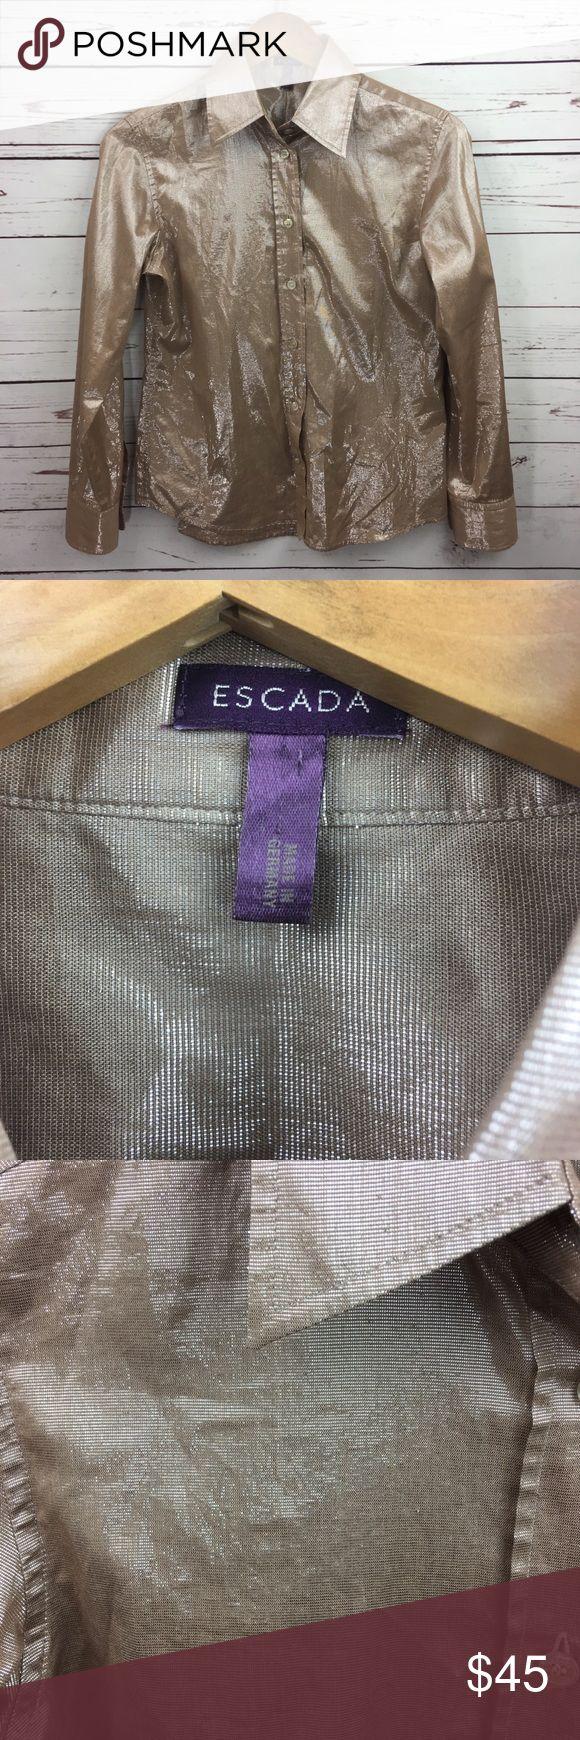 "Escada Gold Metallic Shimmer Button Down Blouse Escada women's gold button down long sleeve shirt. Metallic, and shimmery. Size 36. Cotton.  Underarm to Underarm: 18""  Top shoulder to bottom: 23.5""  3WLS10171250 Escada Tops Button Down Shirts"